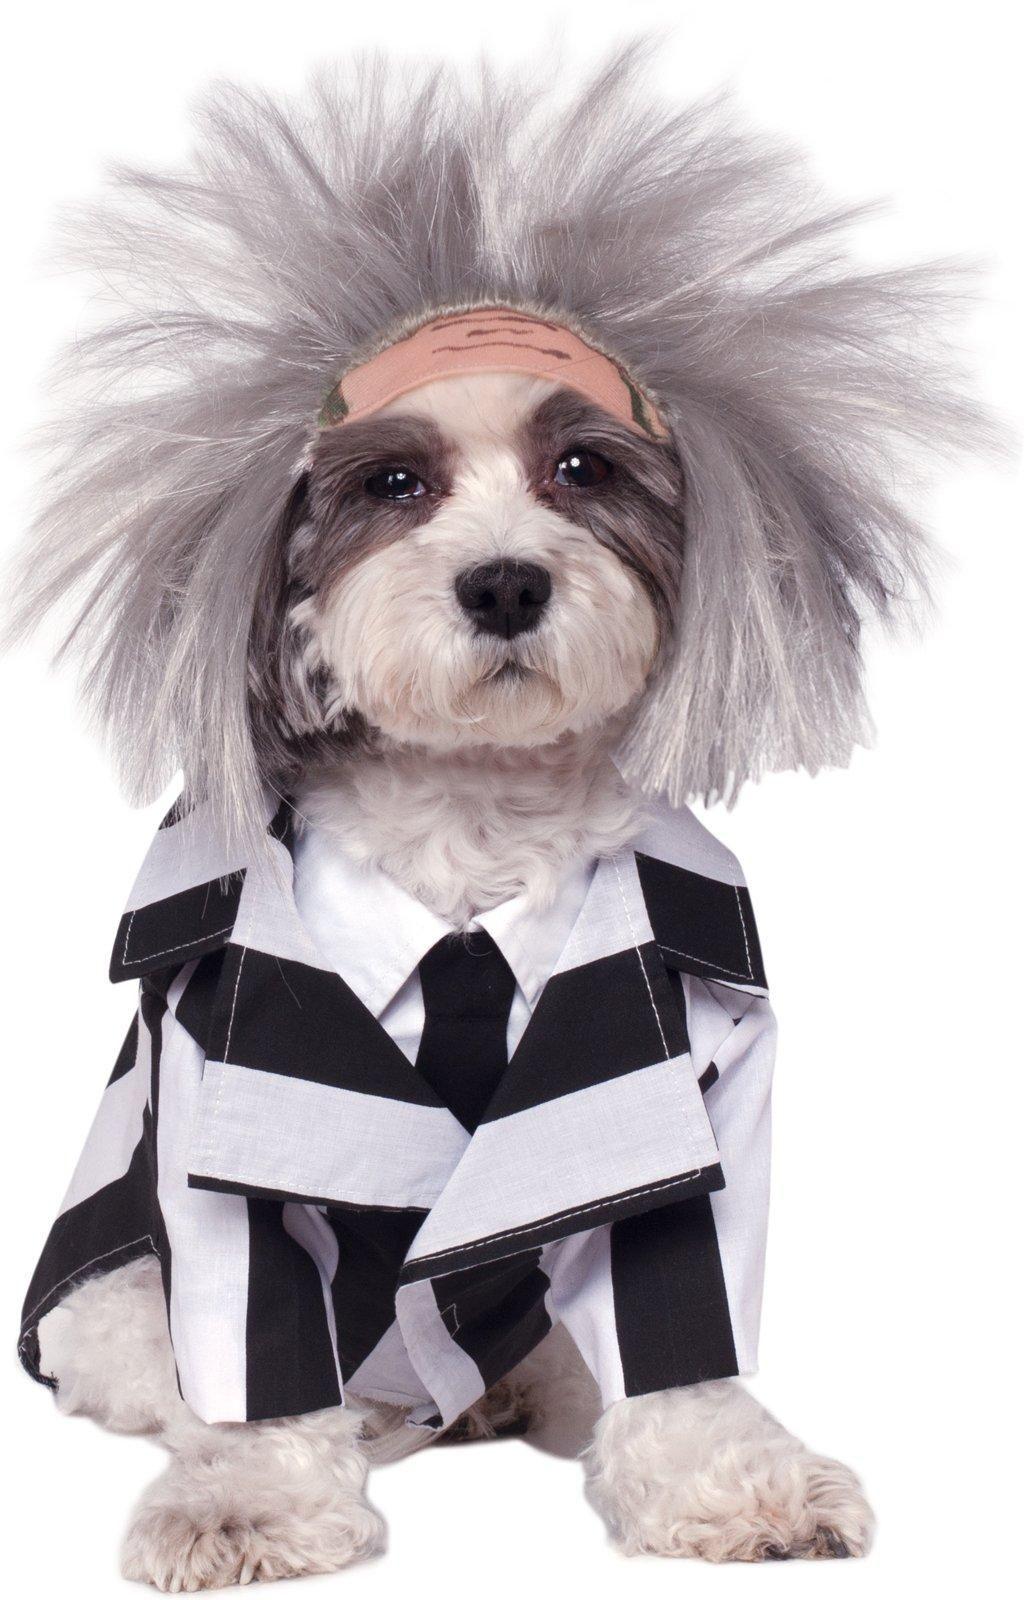 Beetlejuice Costume For Pets Pet Halloween Costumes Dog